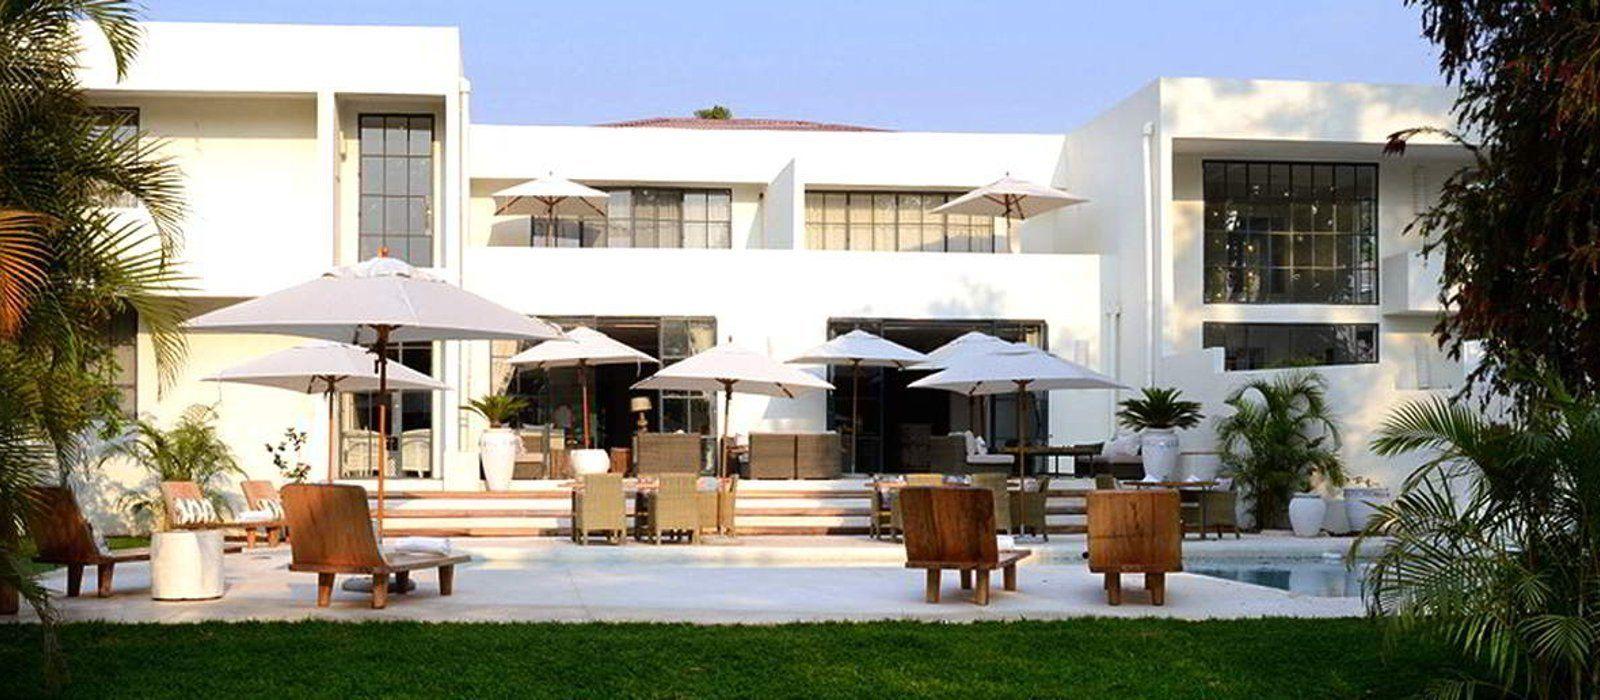 Hotel Latitude 15 Sambia